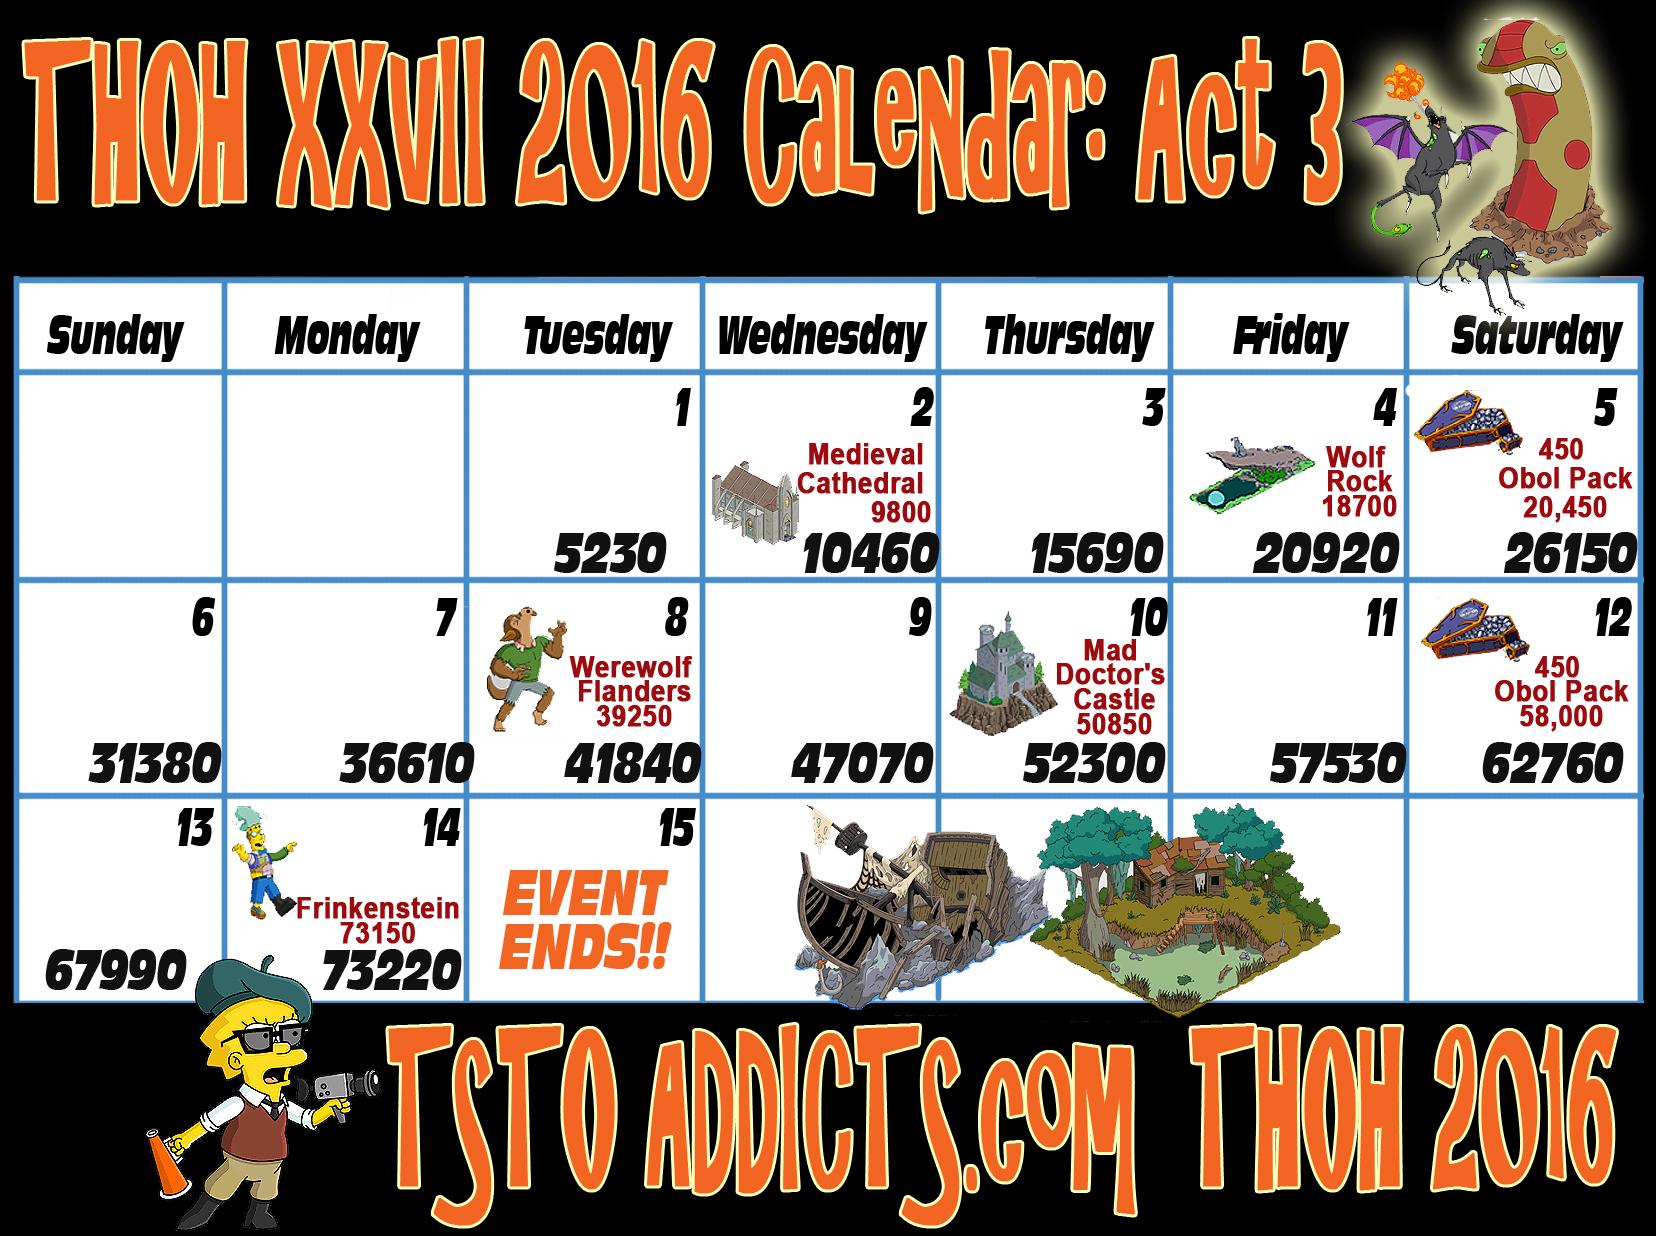 calendar-actiii.jpg